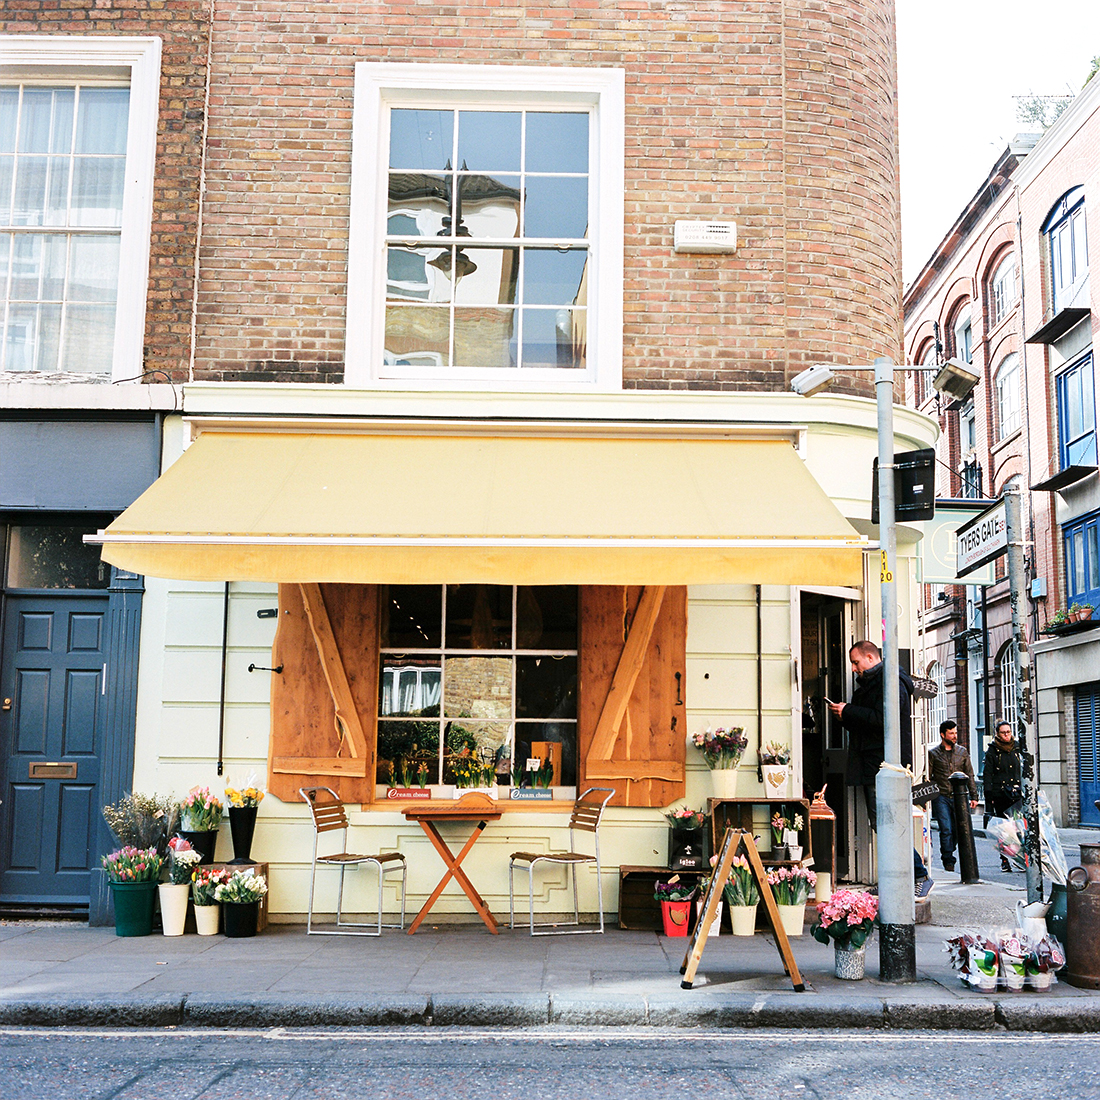 Shop in Bermondsey